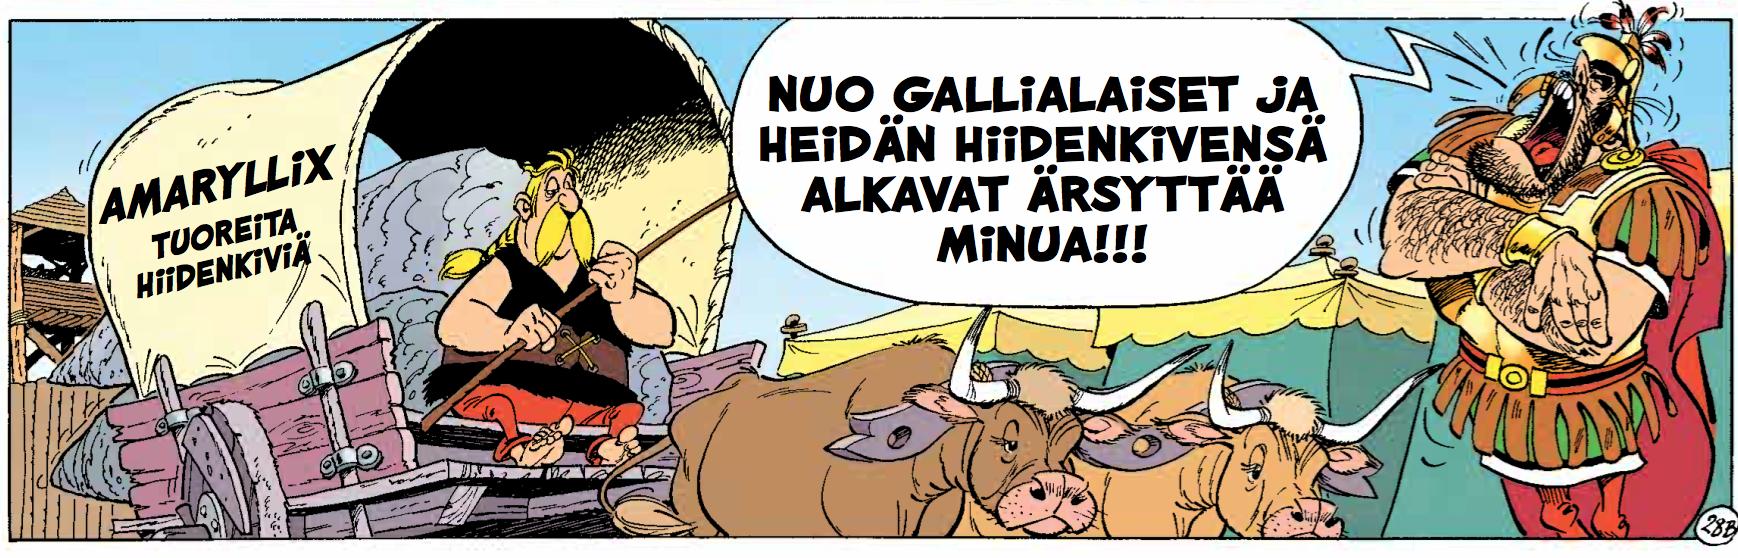 Asterix - Obelix ja kumppanit. #Egmont #sarjakuva #sarjis #Uderzo #Goscinny